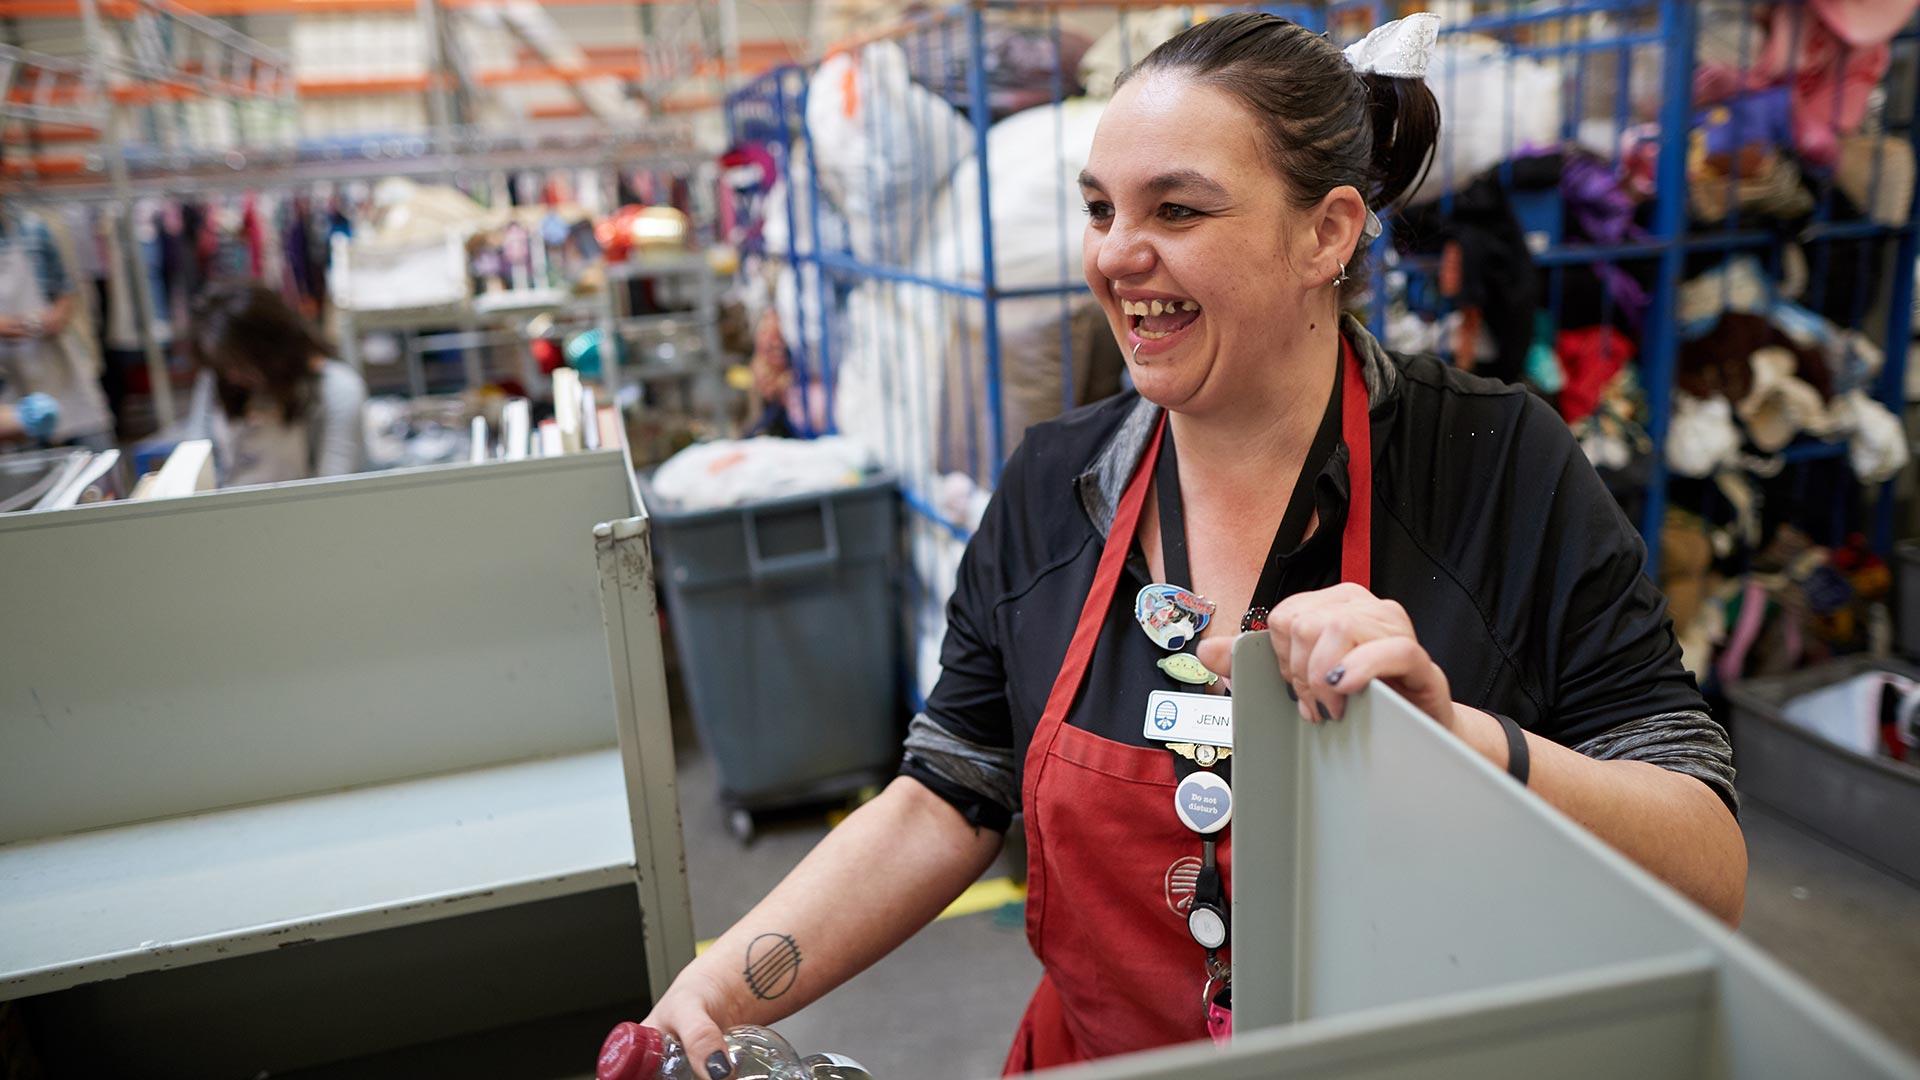 associate Jennifer sorts donations at Deseret Industries